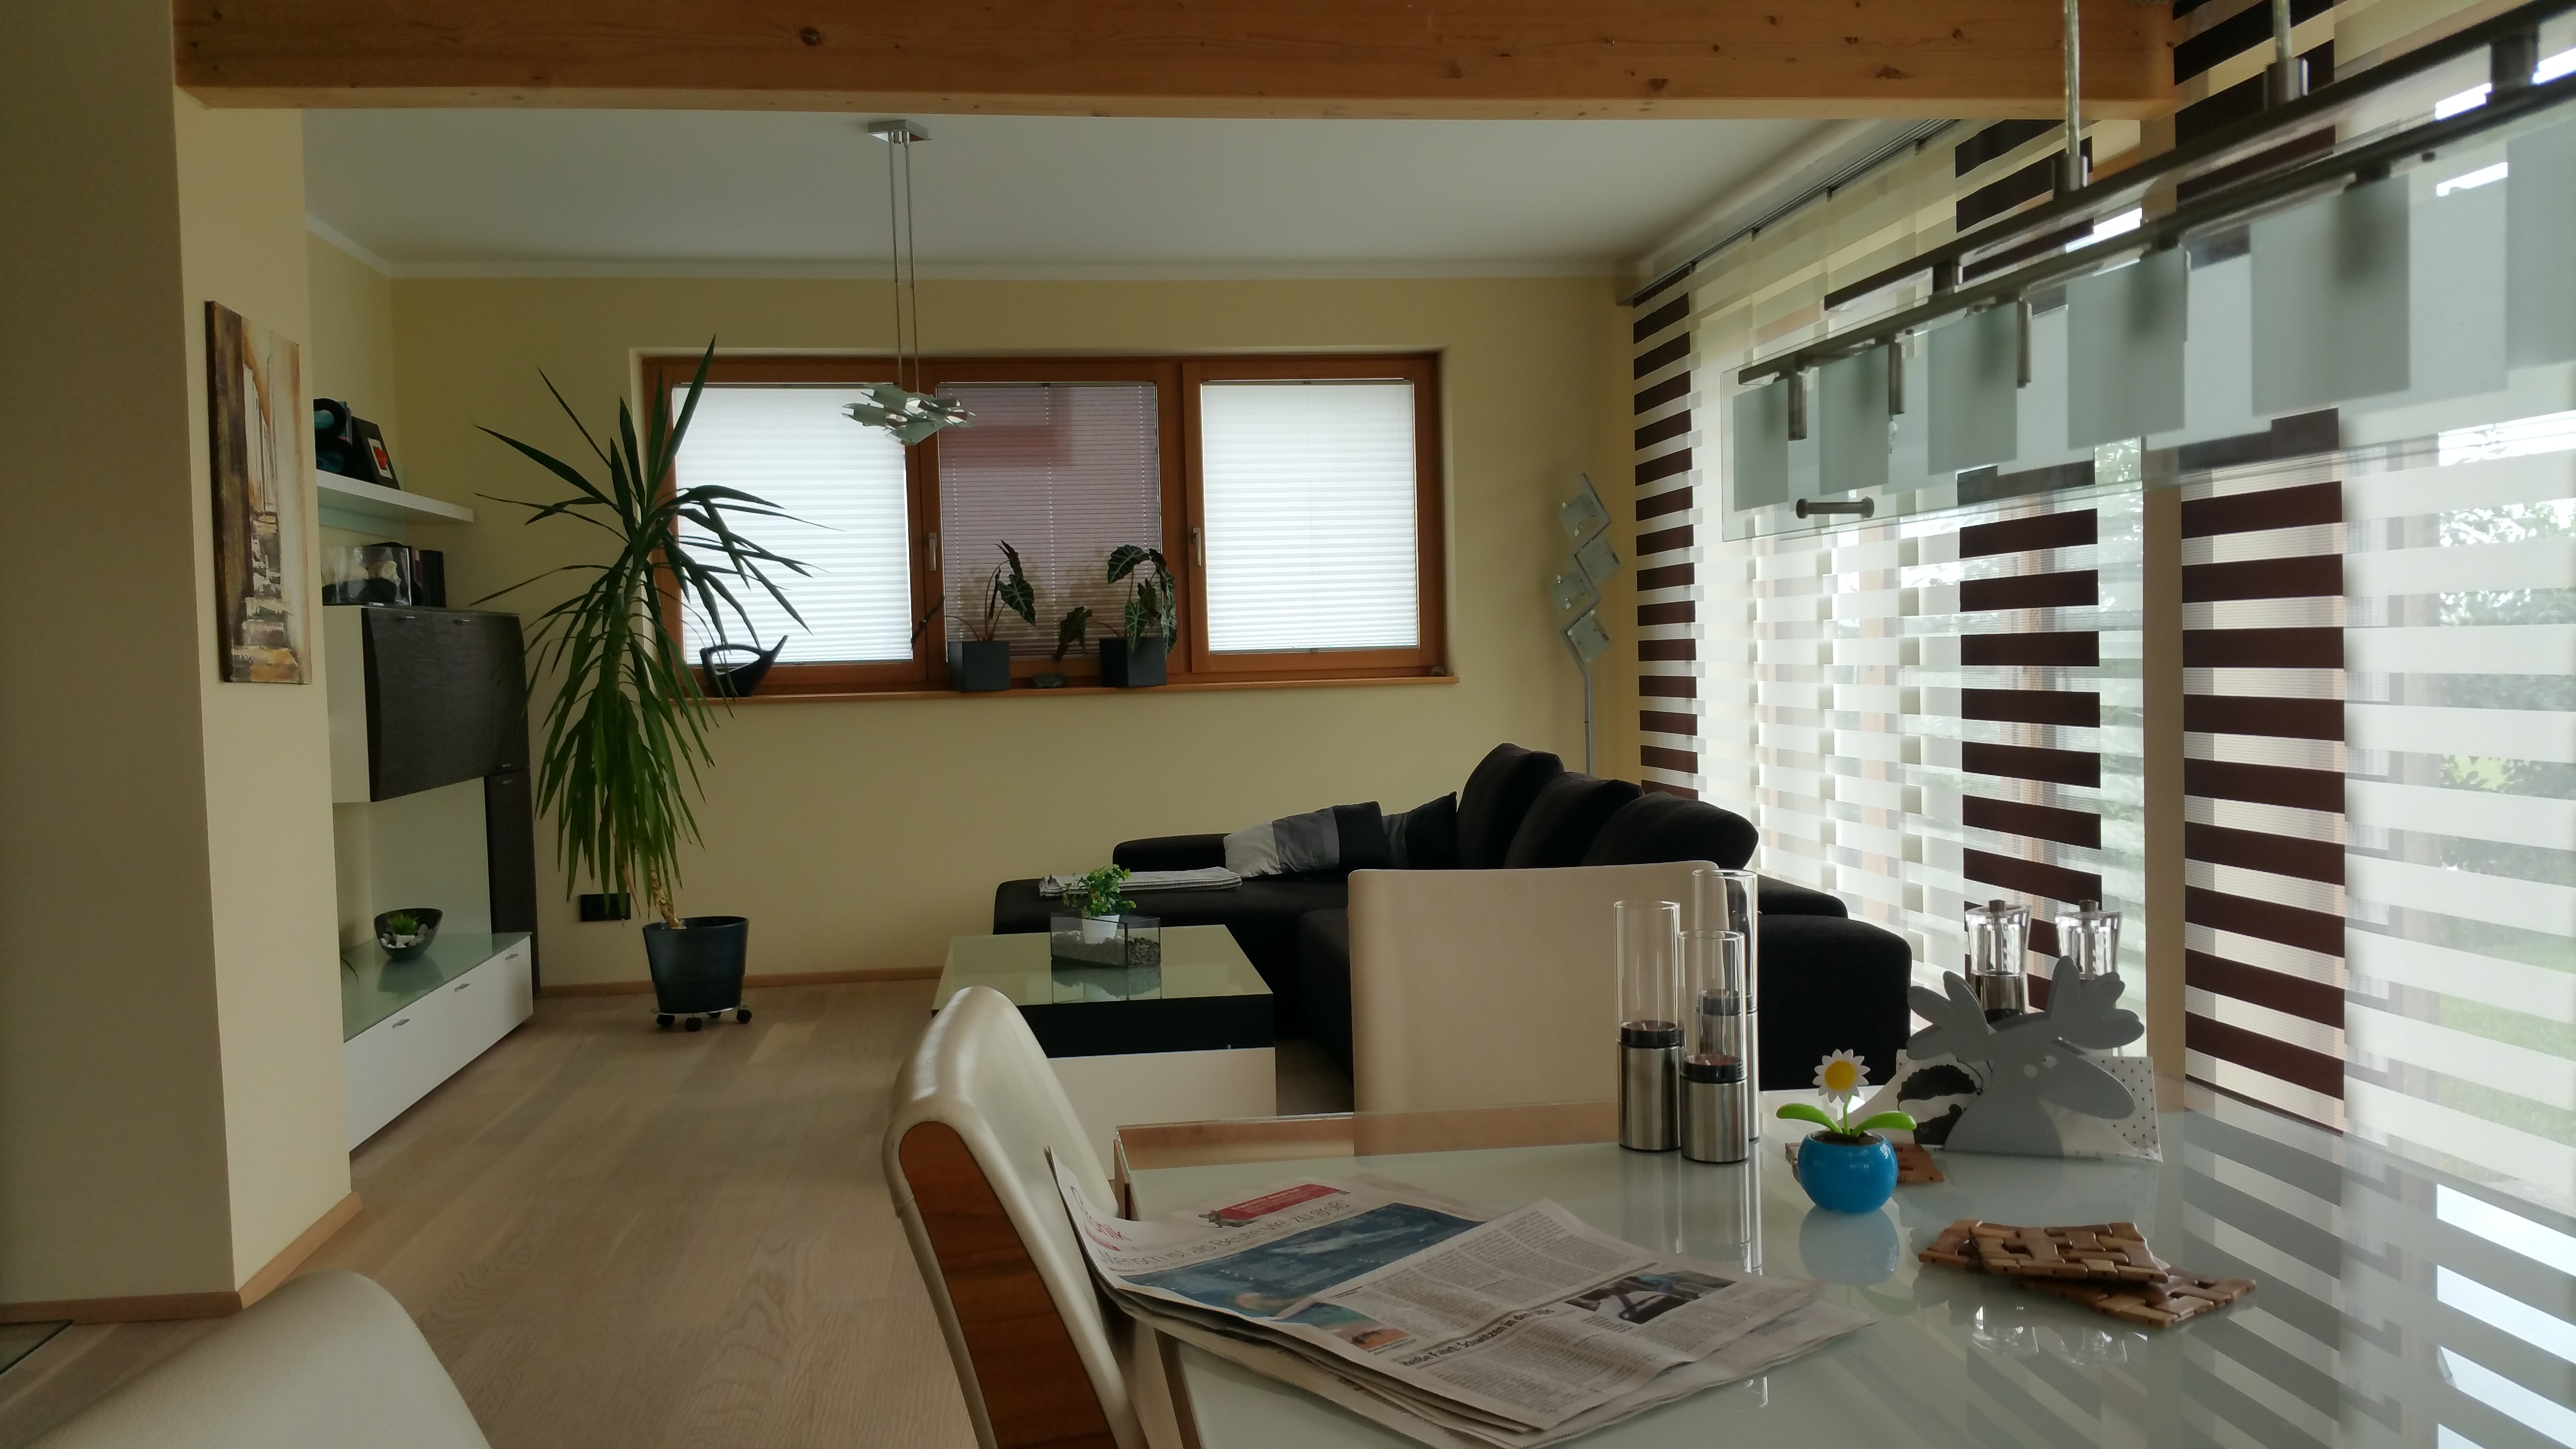 Großzügig Tapeten Ideen Für Wohnküche Ideen - Küchenschrank Ideen ...